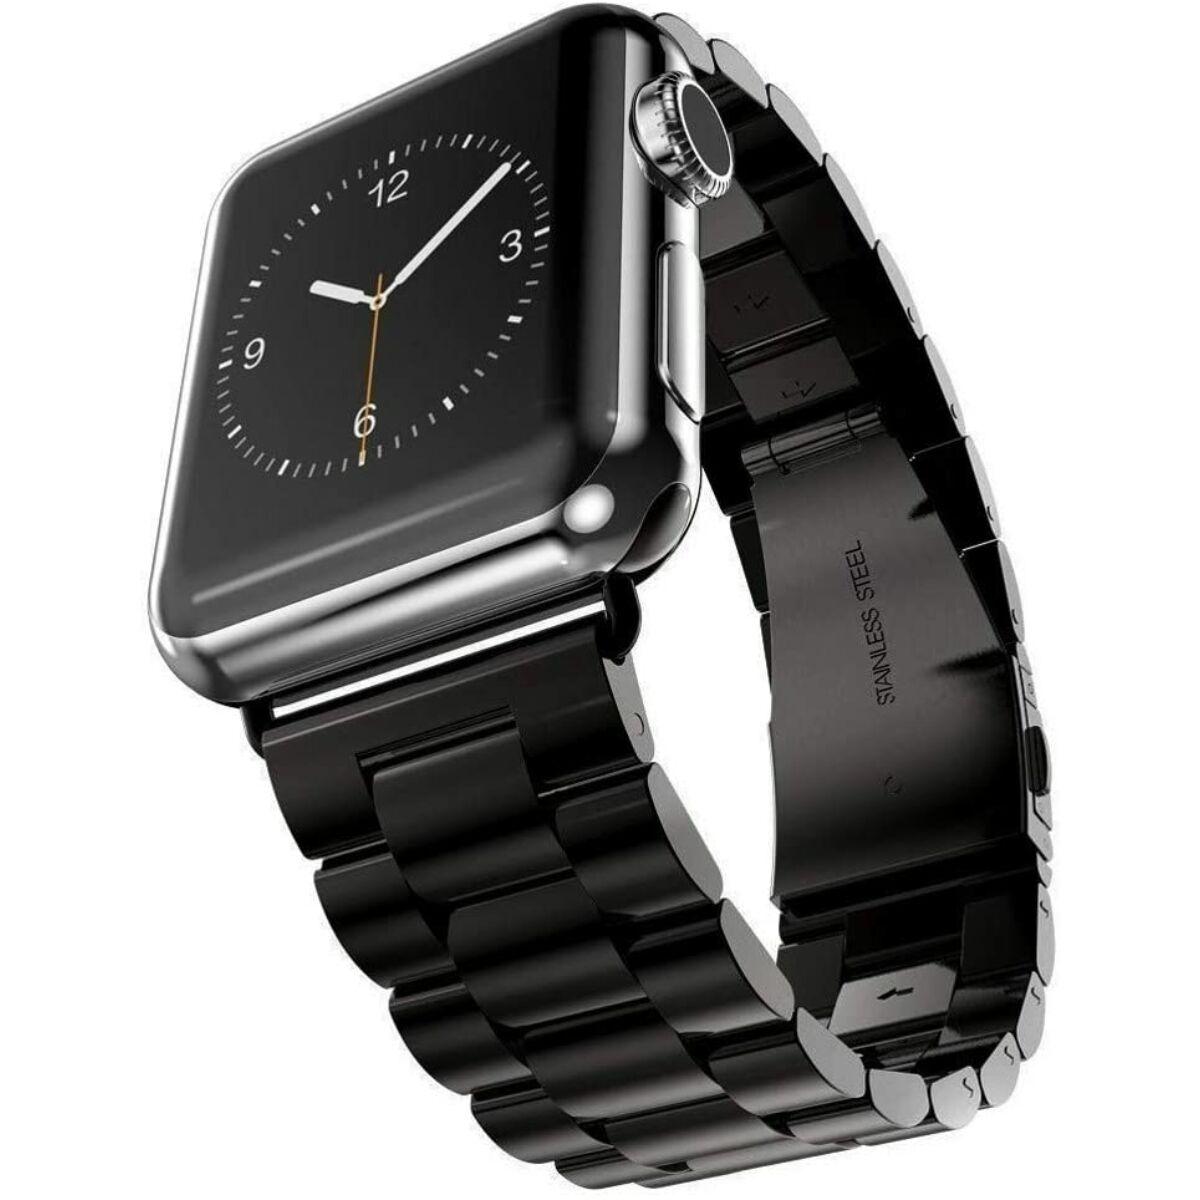 Ringke Apple Watch óraszíj 38 mm/40mm, Metal One Stainless Steel, fekete